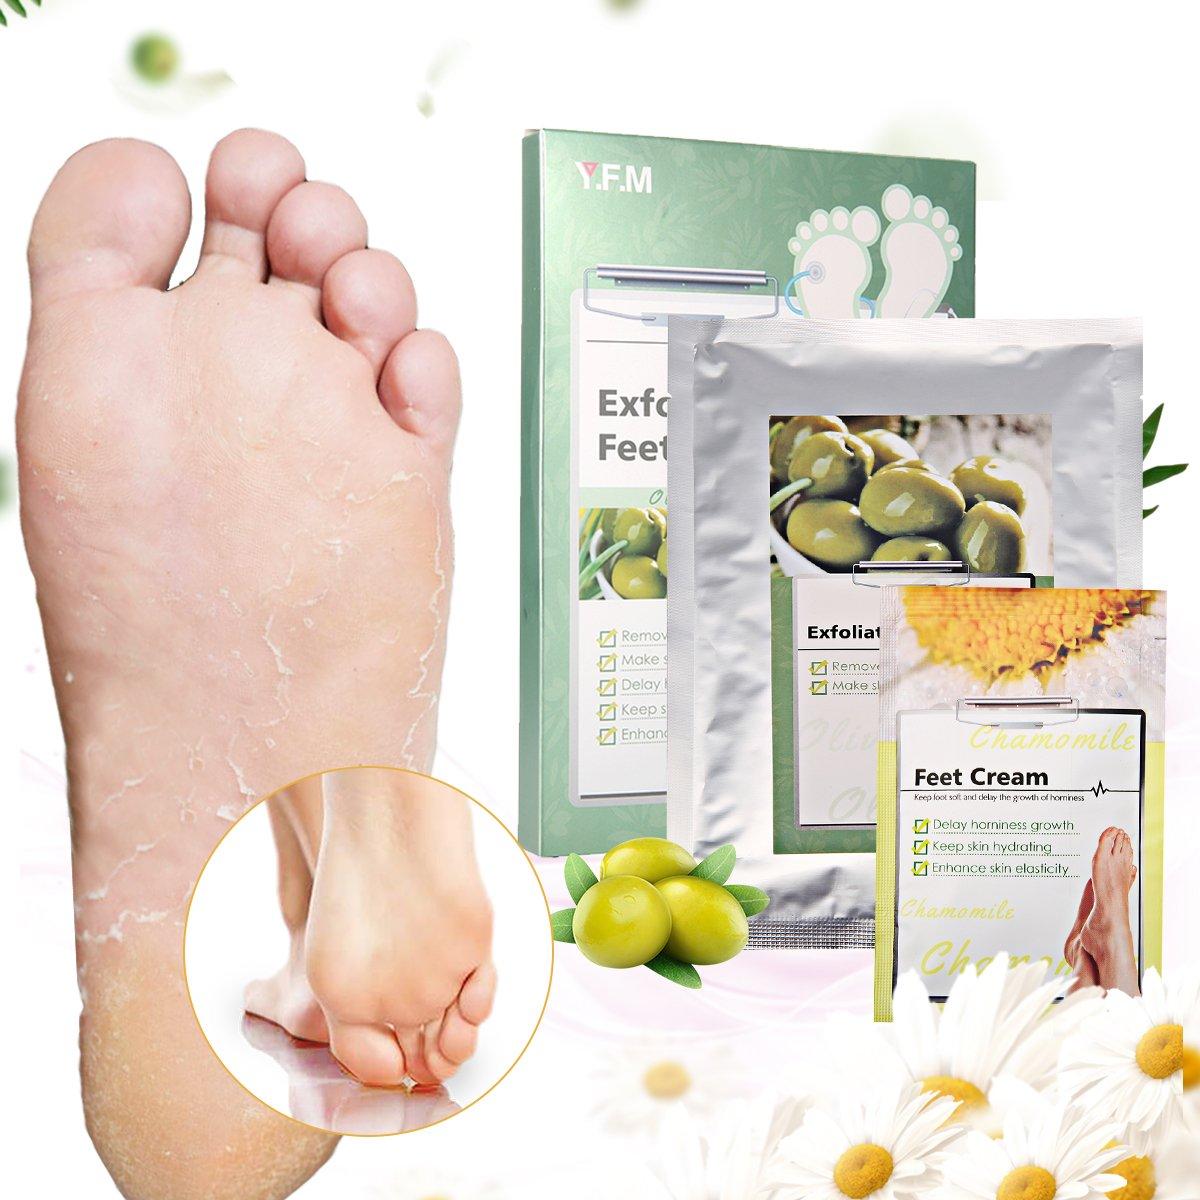 Foot Peel Mask-LuckyFine Foot Peeling Mask, Exfoliating Calluses and Dead Skin Remover,Repair Rough Heels, Get Soft Touch Foot in 1-2 Weeks(1 Pair Olive Feet Mask+1 Pcs Foot Cream Per Box)